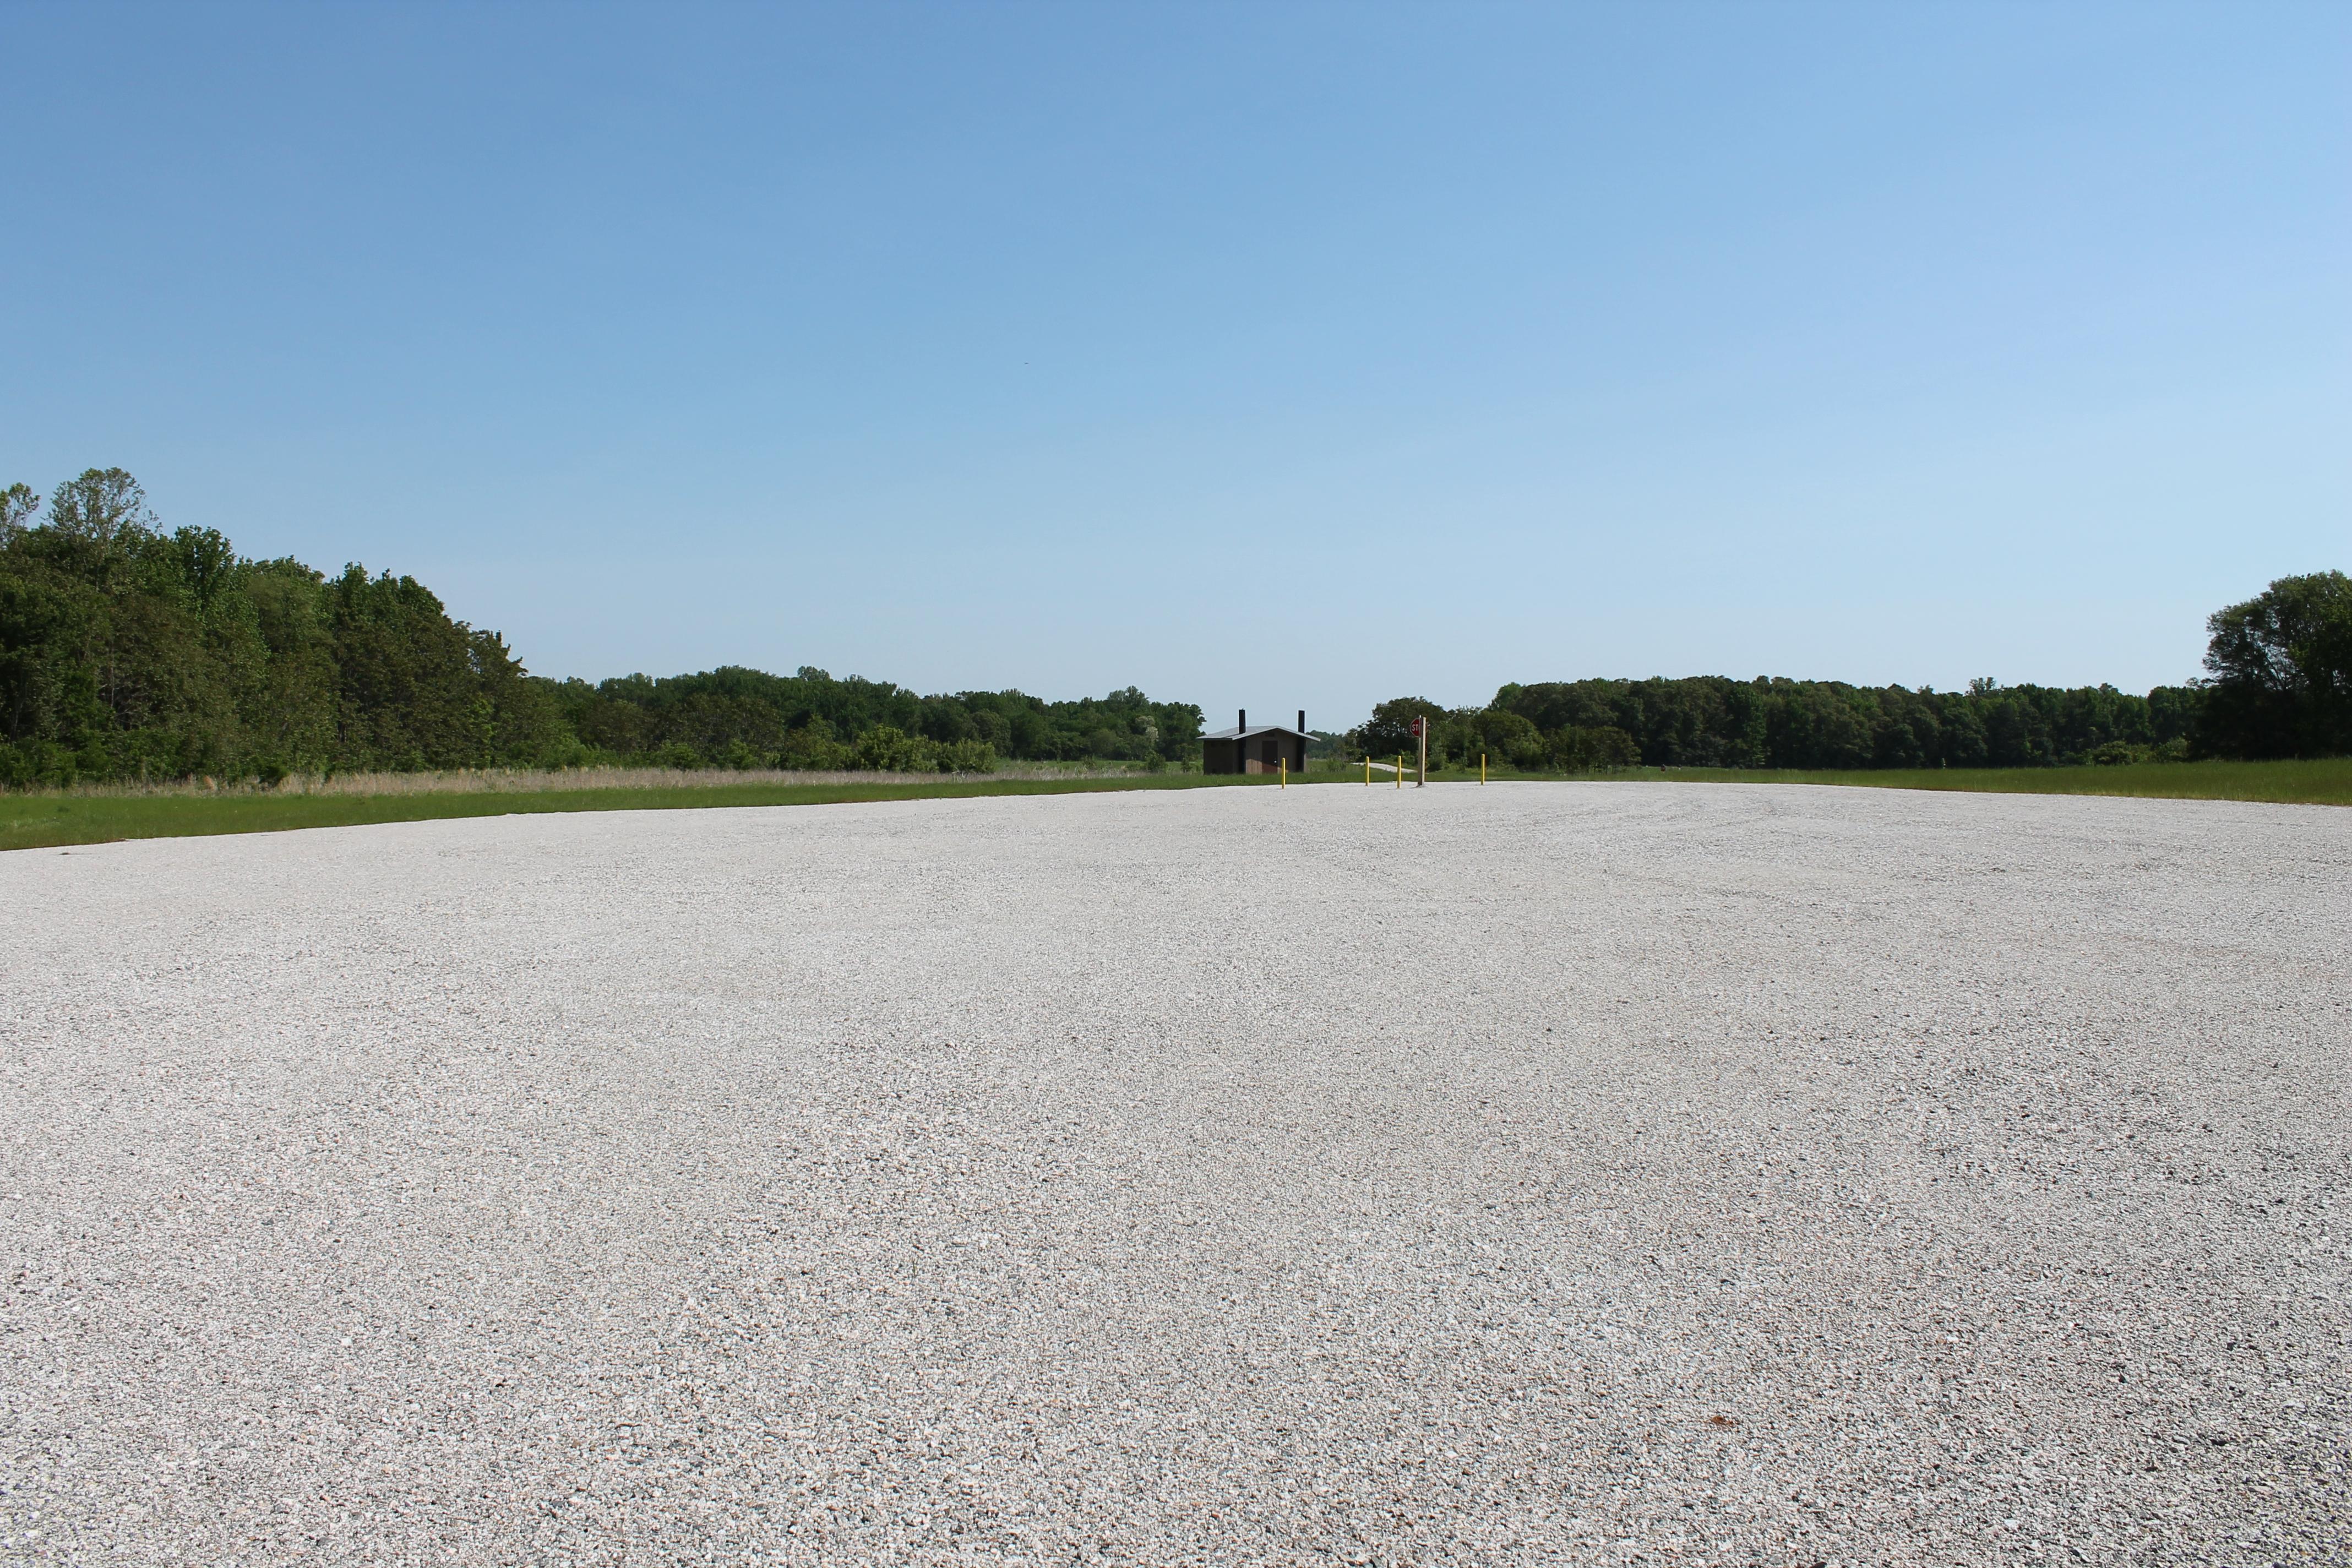 File:Horse Parking Lot (8725994441).jpg - Wikimedia Commons